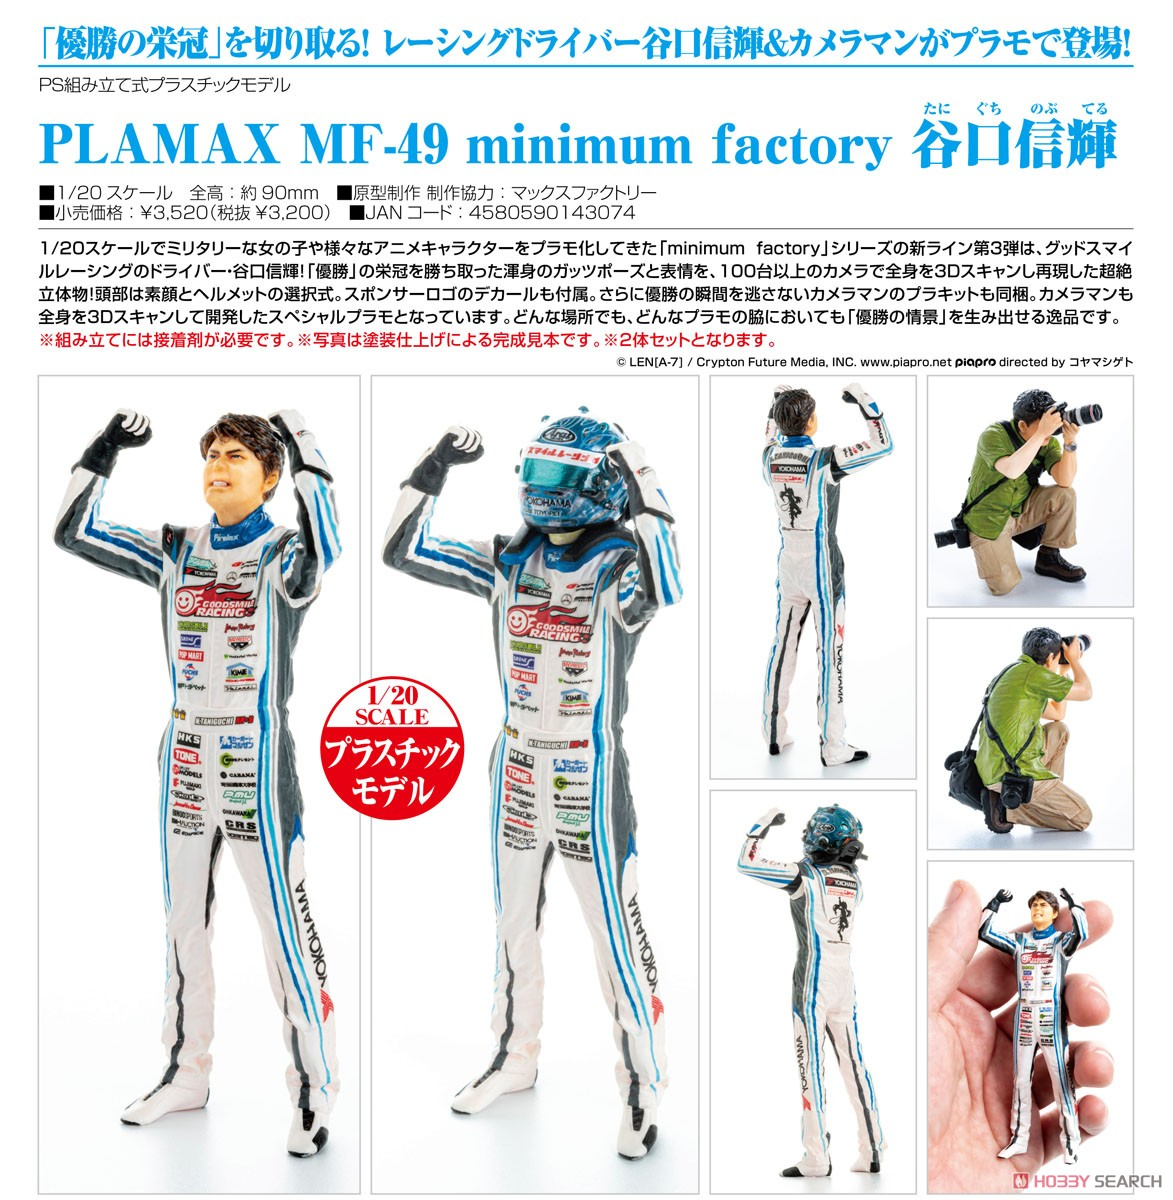 PLAMAX MF-49 minimum factory『谷口信輝』1/20 プラモデル-008